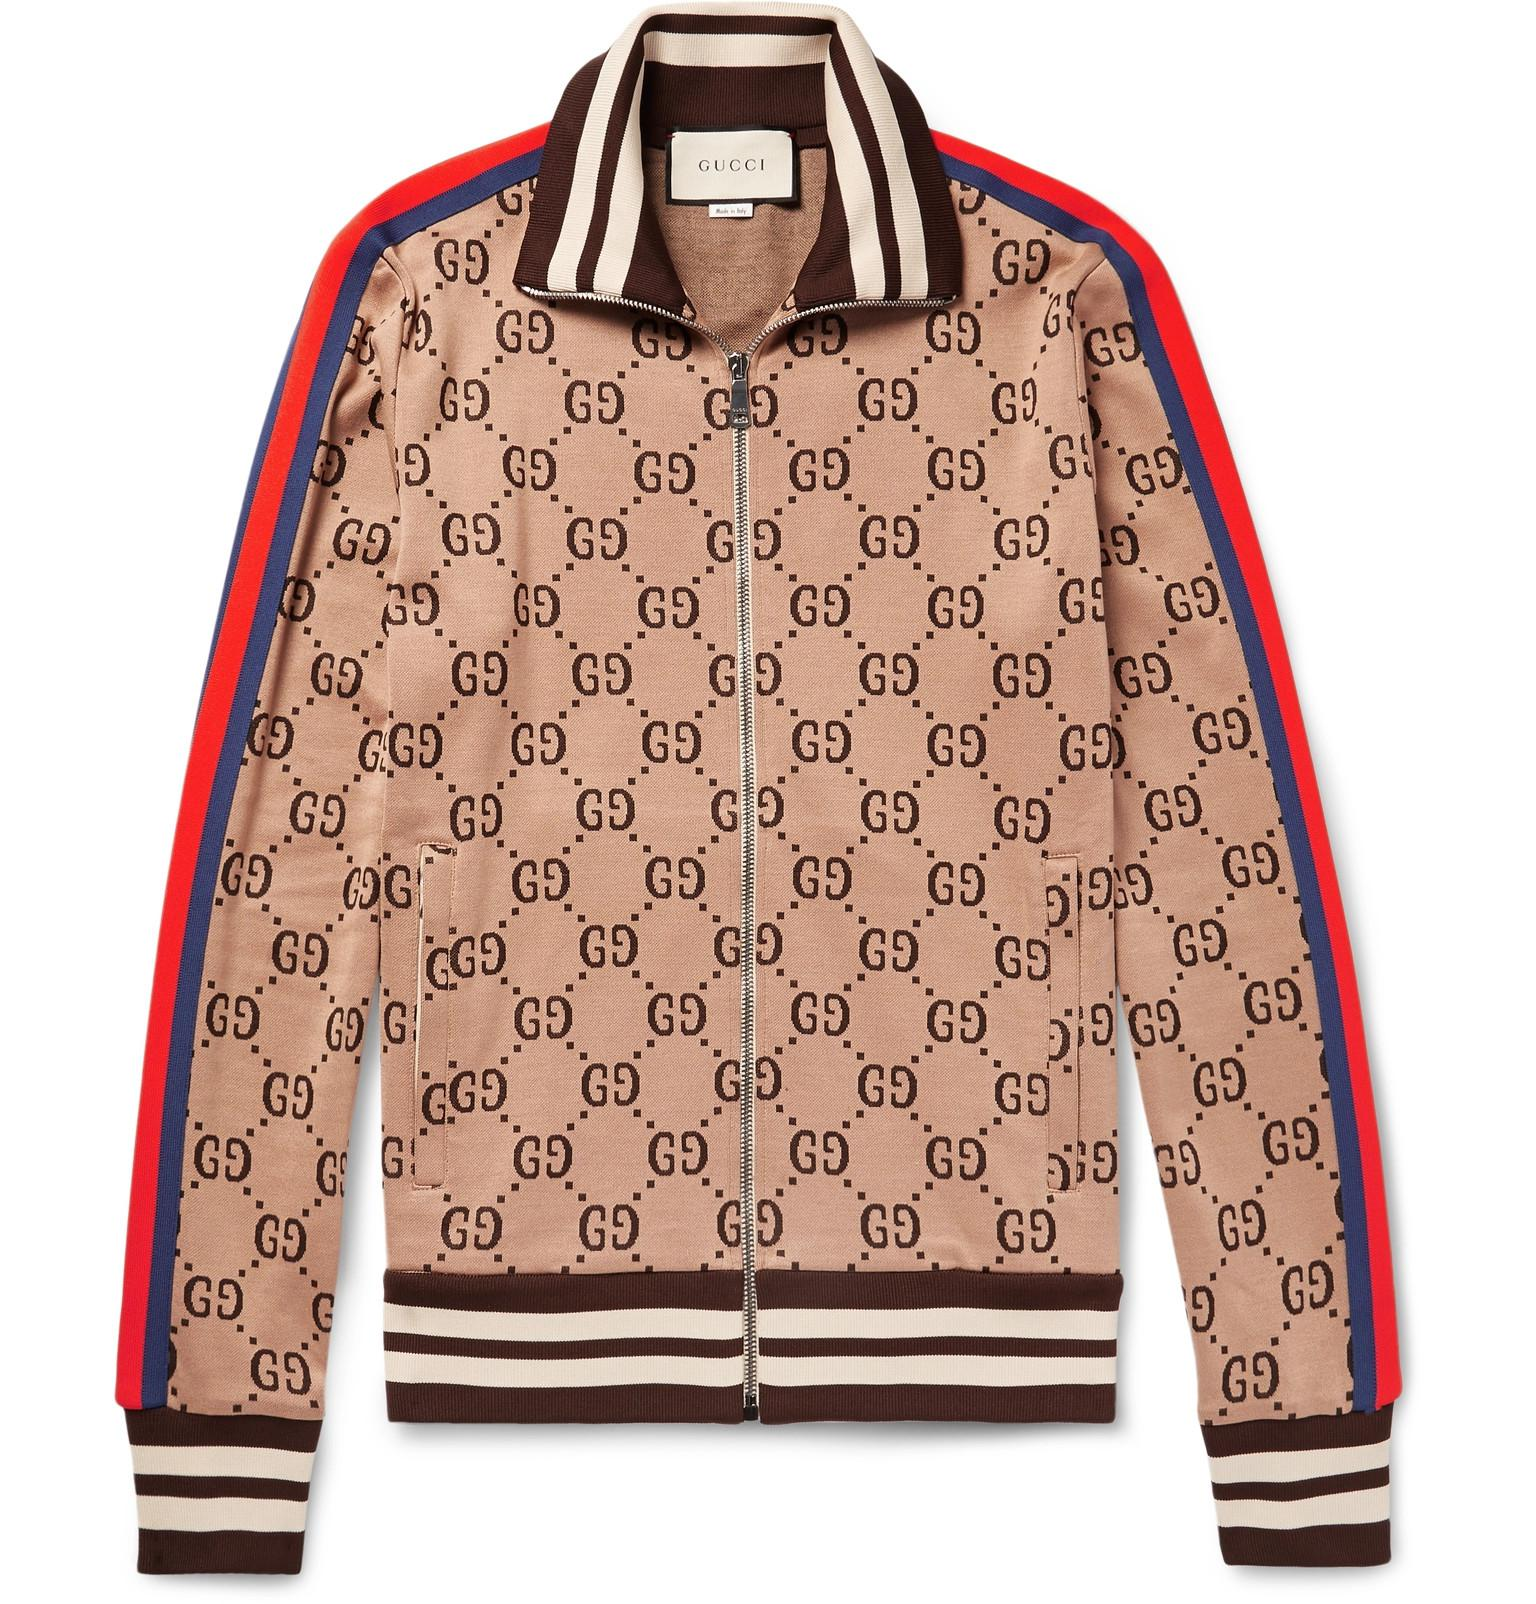 afea00219 Gucci Slim-fit Webbing-trimmed Cotton-jacquard Track Jacket in Brown ...